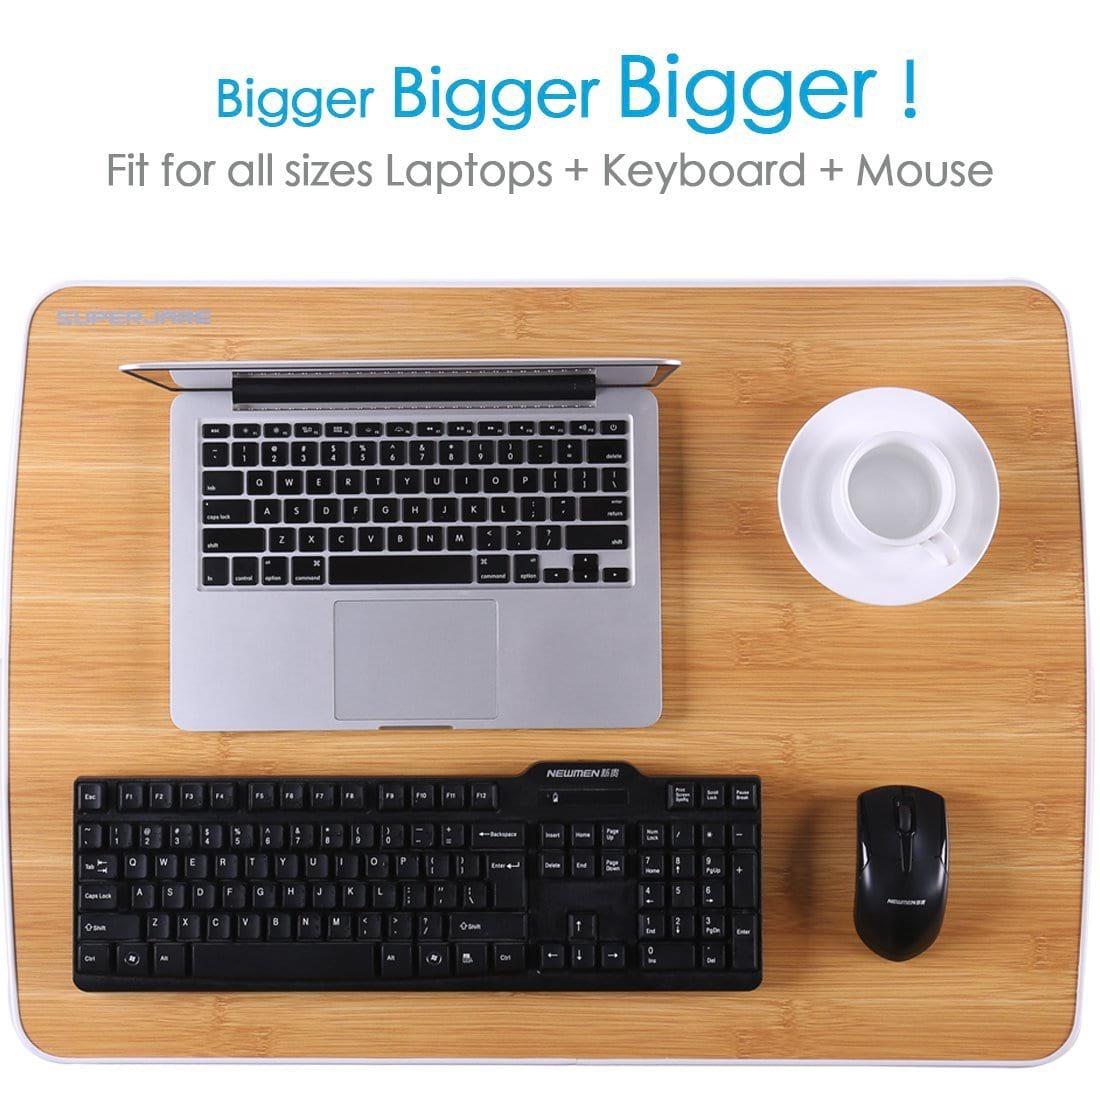 Superjare Laptop Bed Table Bigger and Bigger